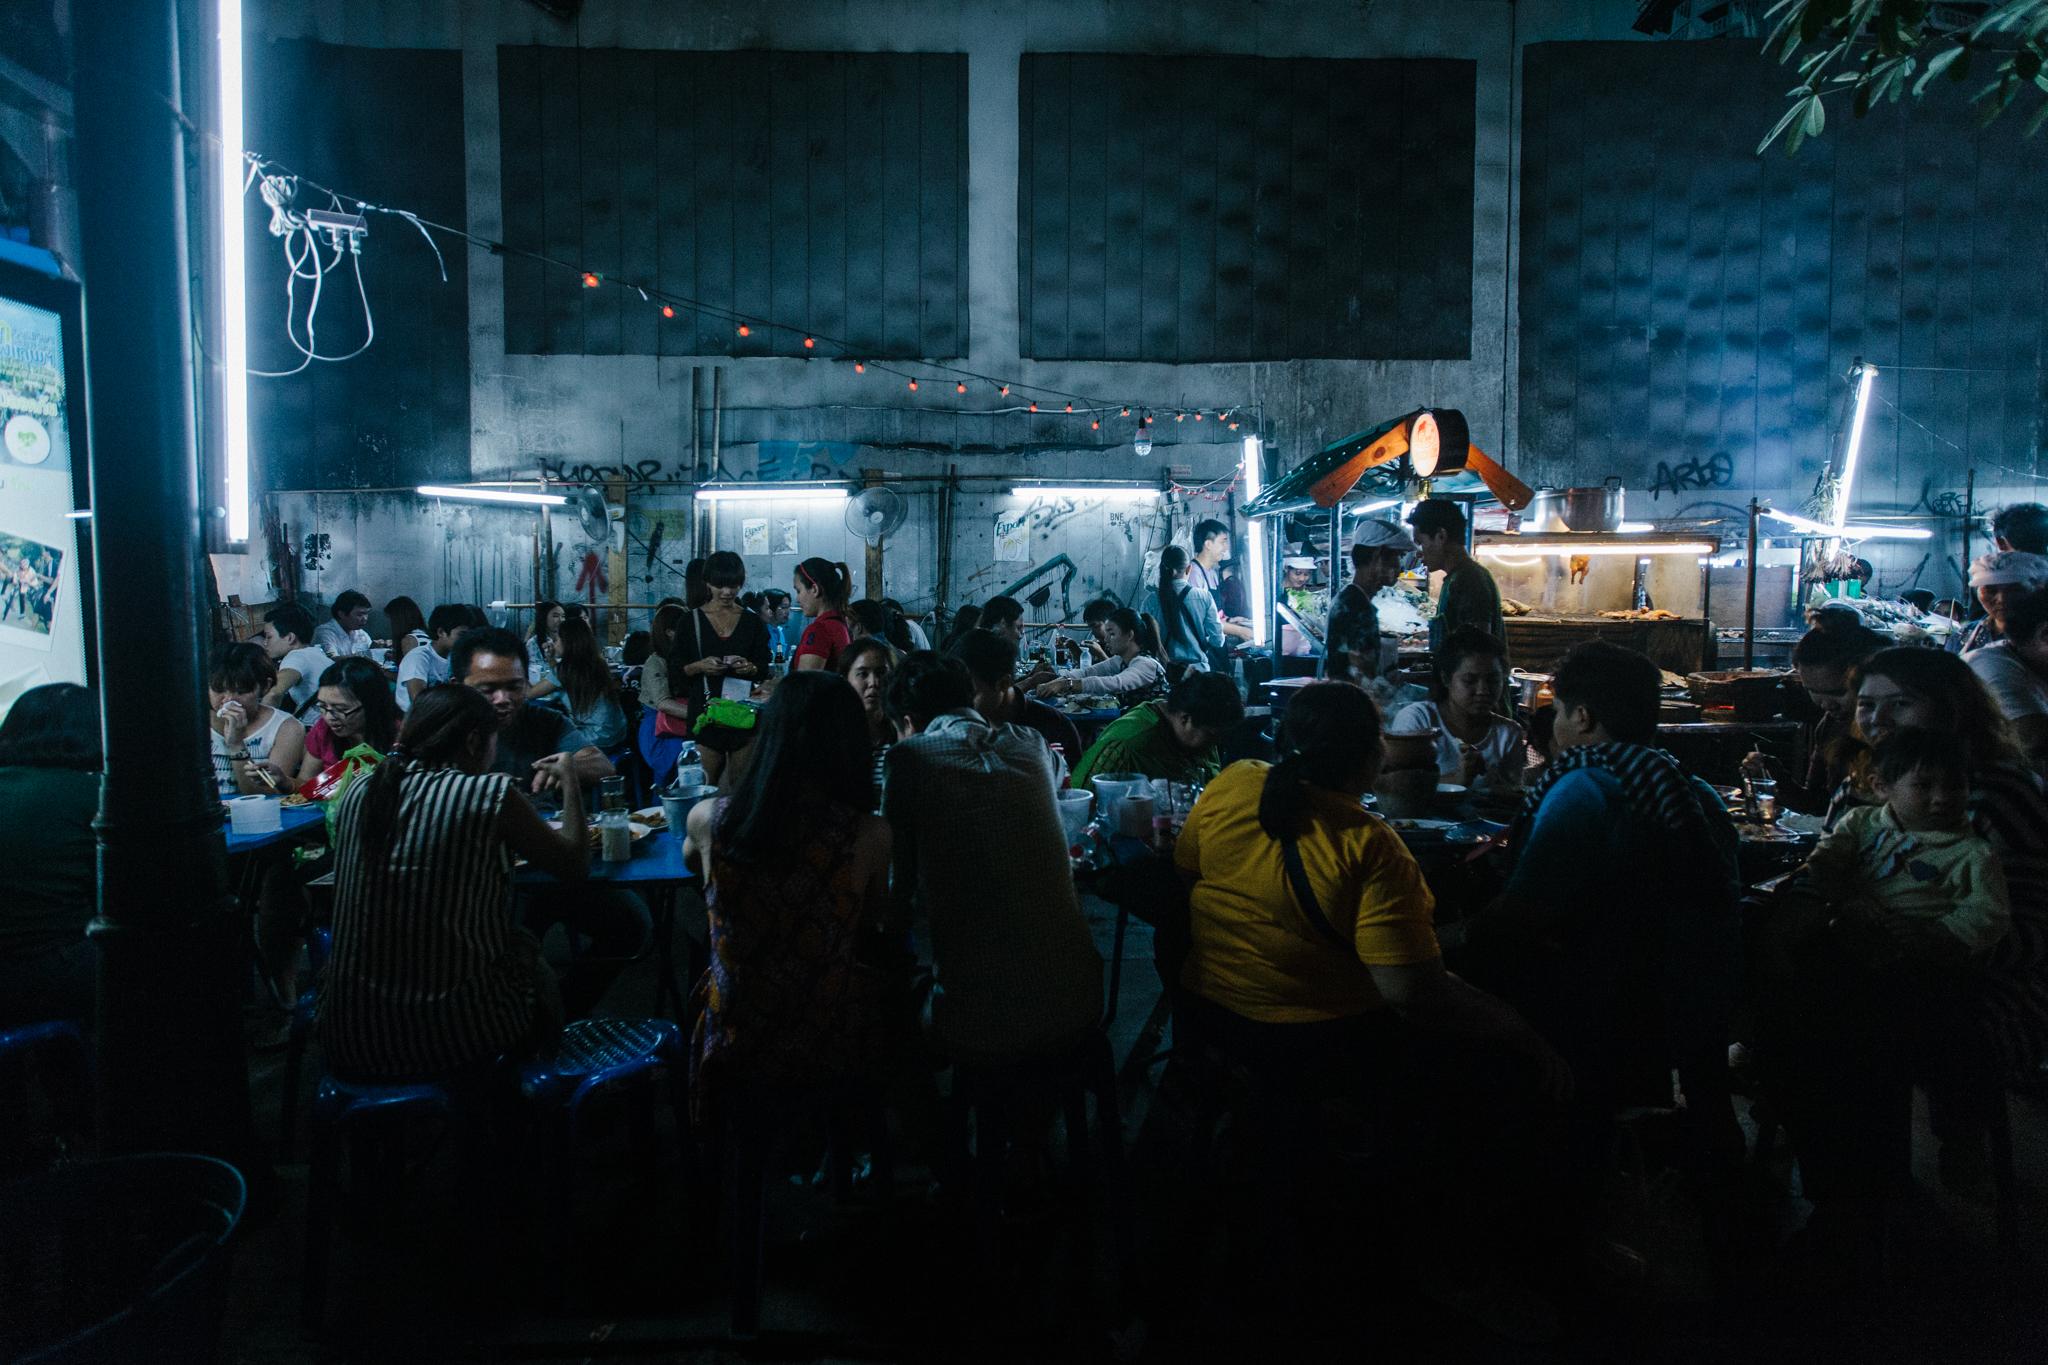 Street food is everywhere in Bangkok, Thailand.